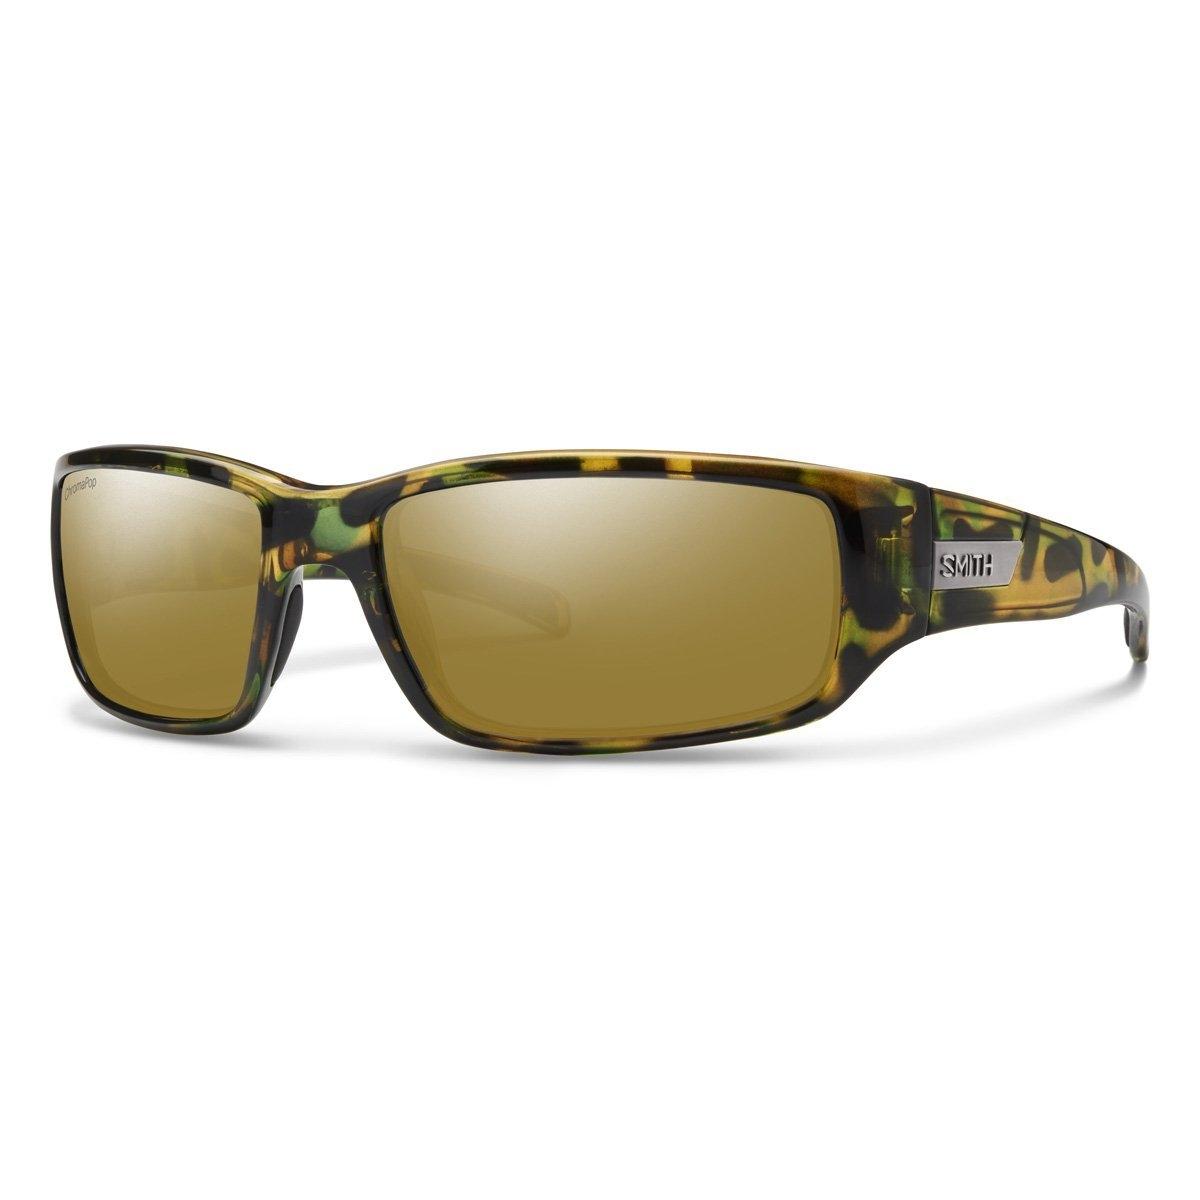 5546ee92c6 SMITH - Smith Prospect ChromaPop Polarized Sunglasses - Walmart.com